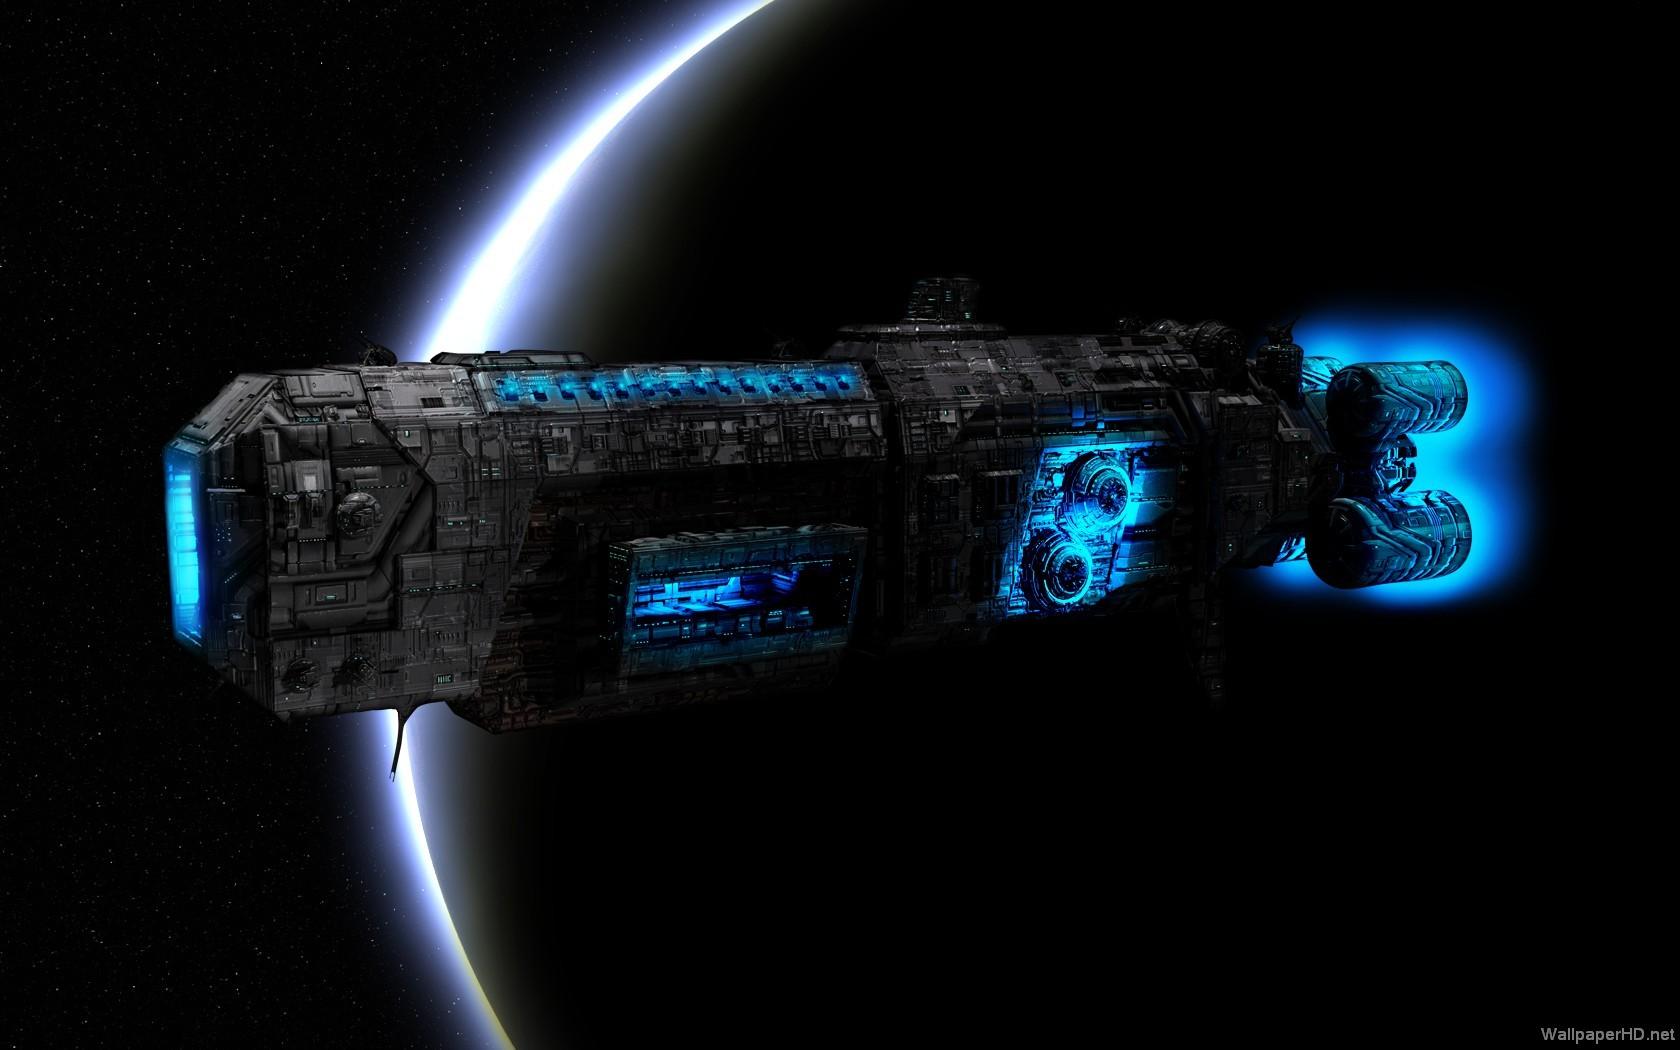 Sfondi desktop hd fantasy nave spaziale sfondi hd gratis for Sfondi spazio full hd